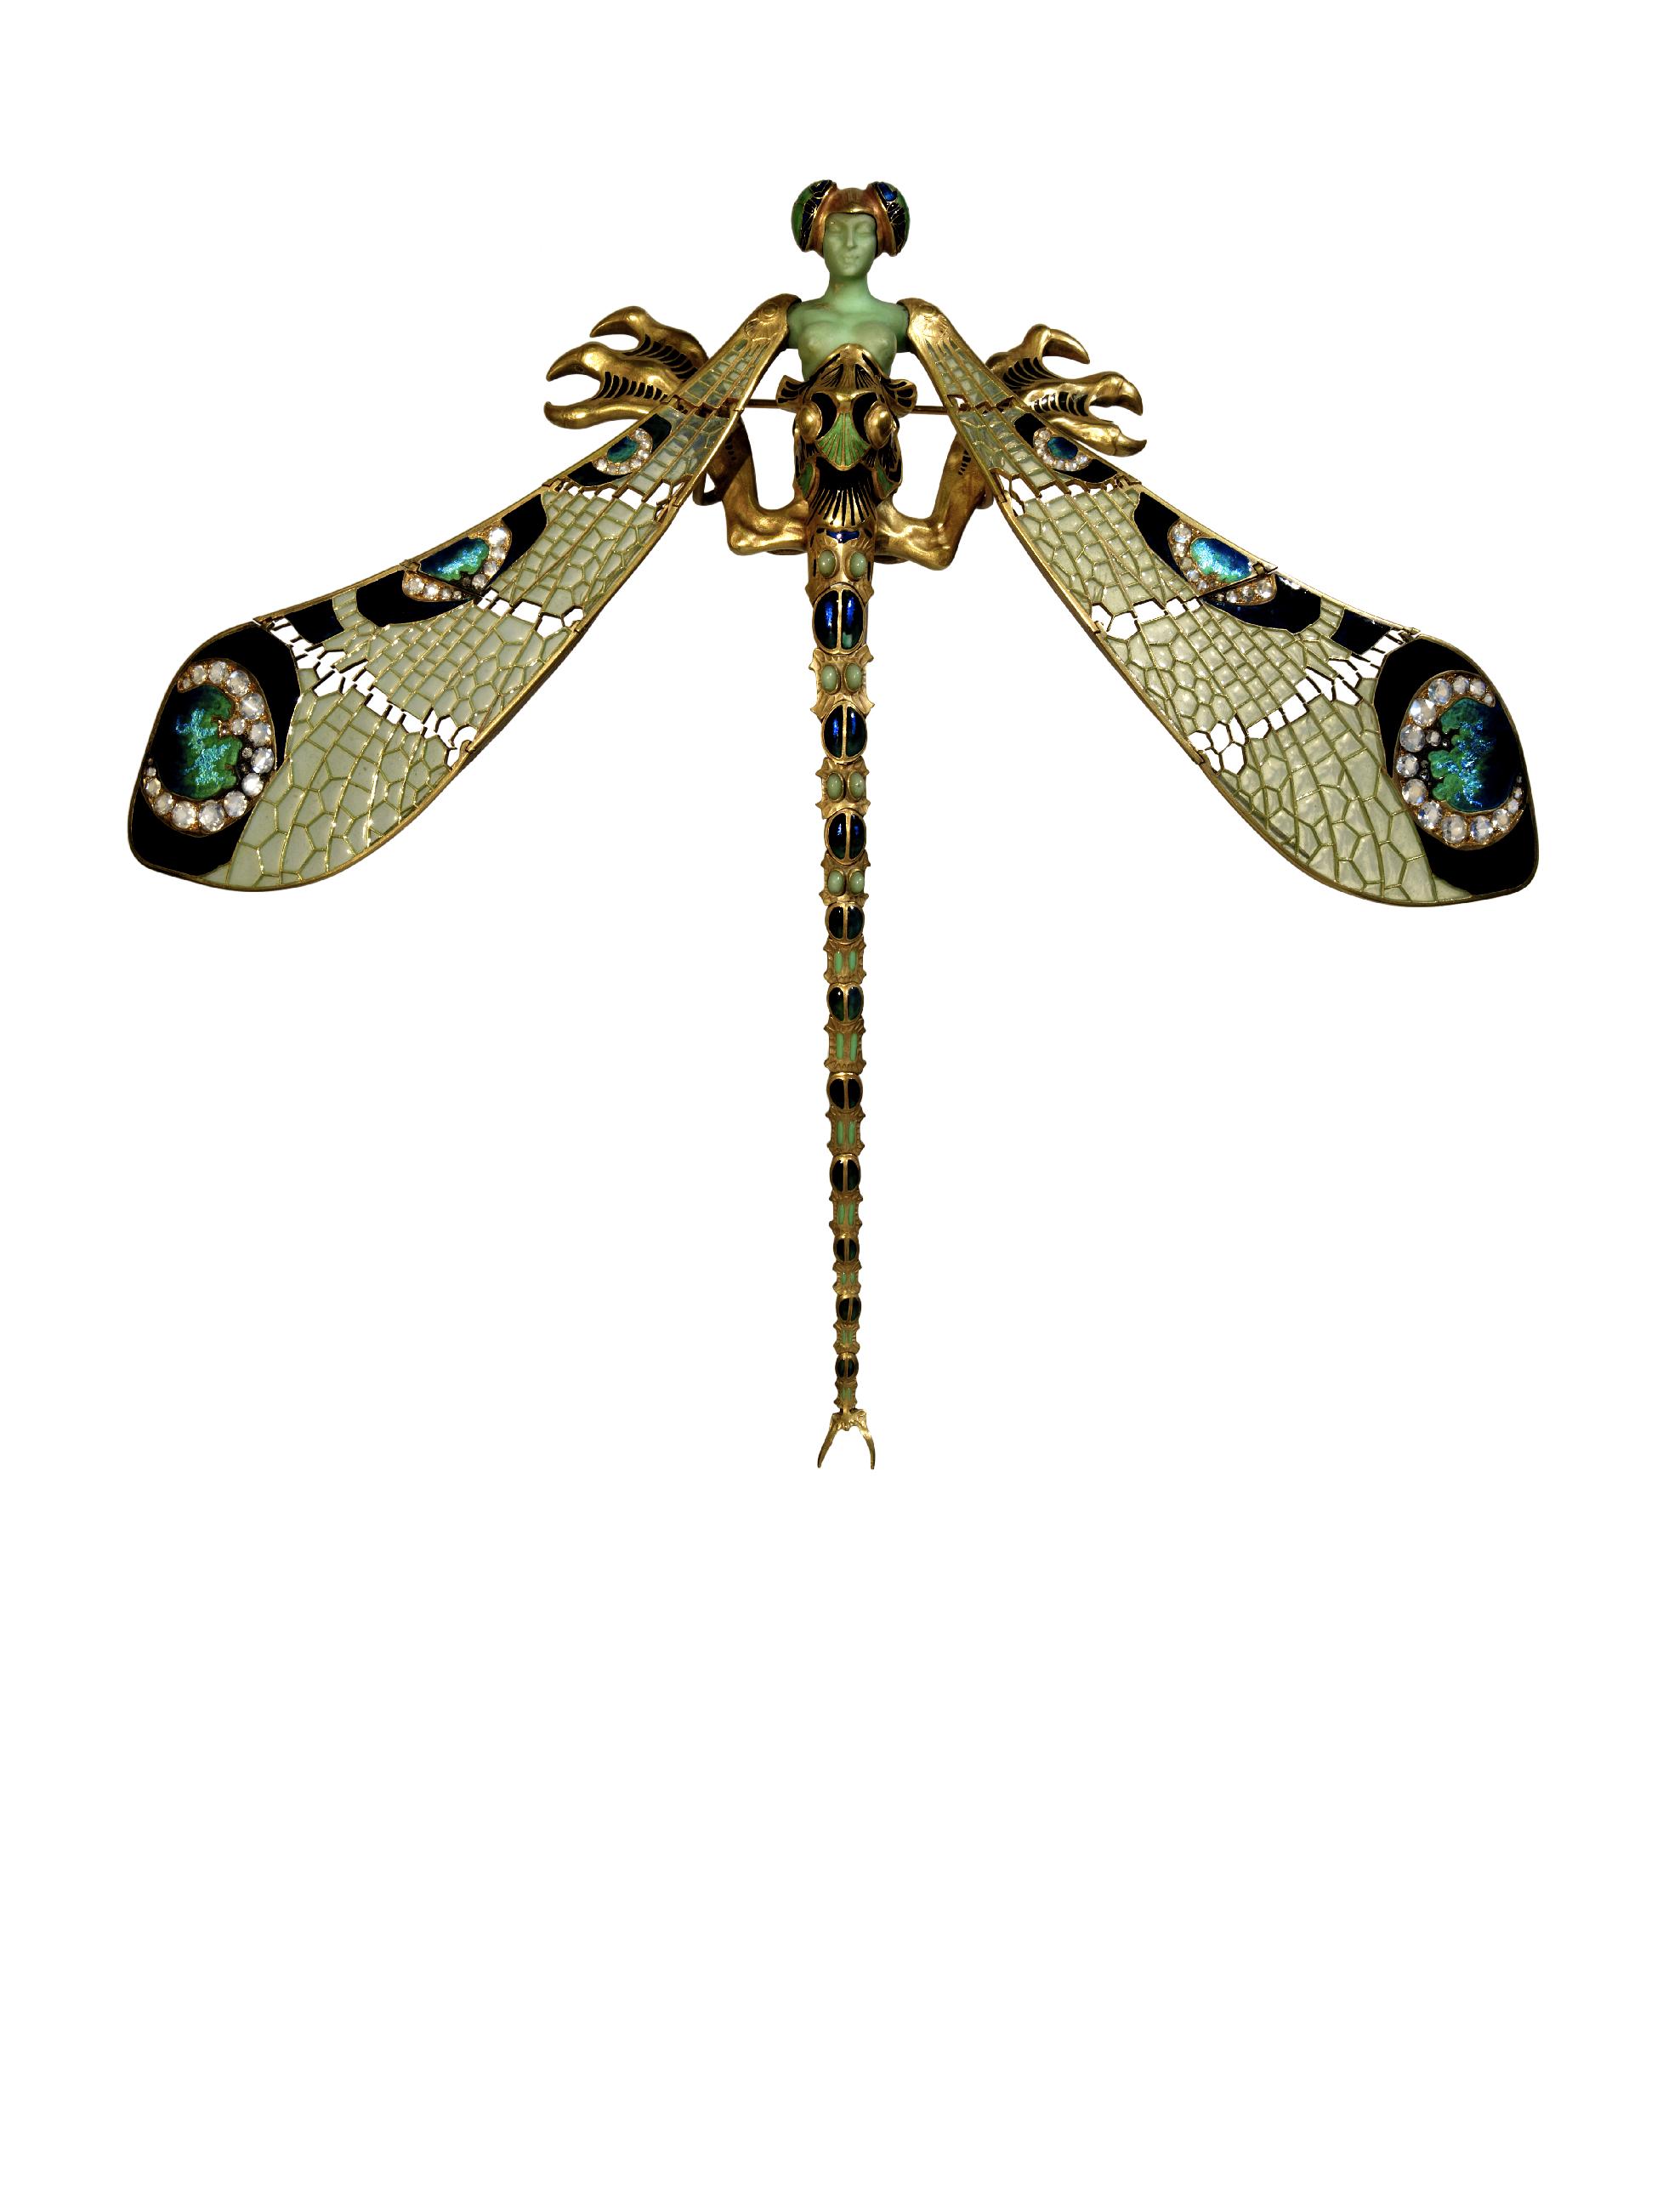 Dragonfly-woman' corsage ornament | Museu Calouste Gulbenkian